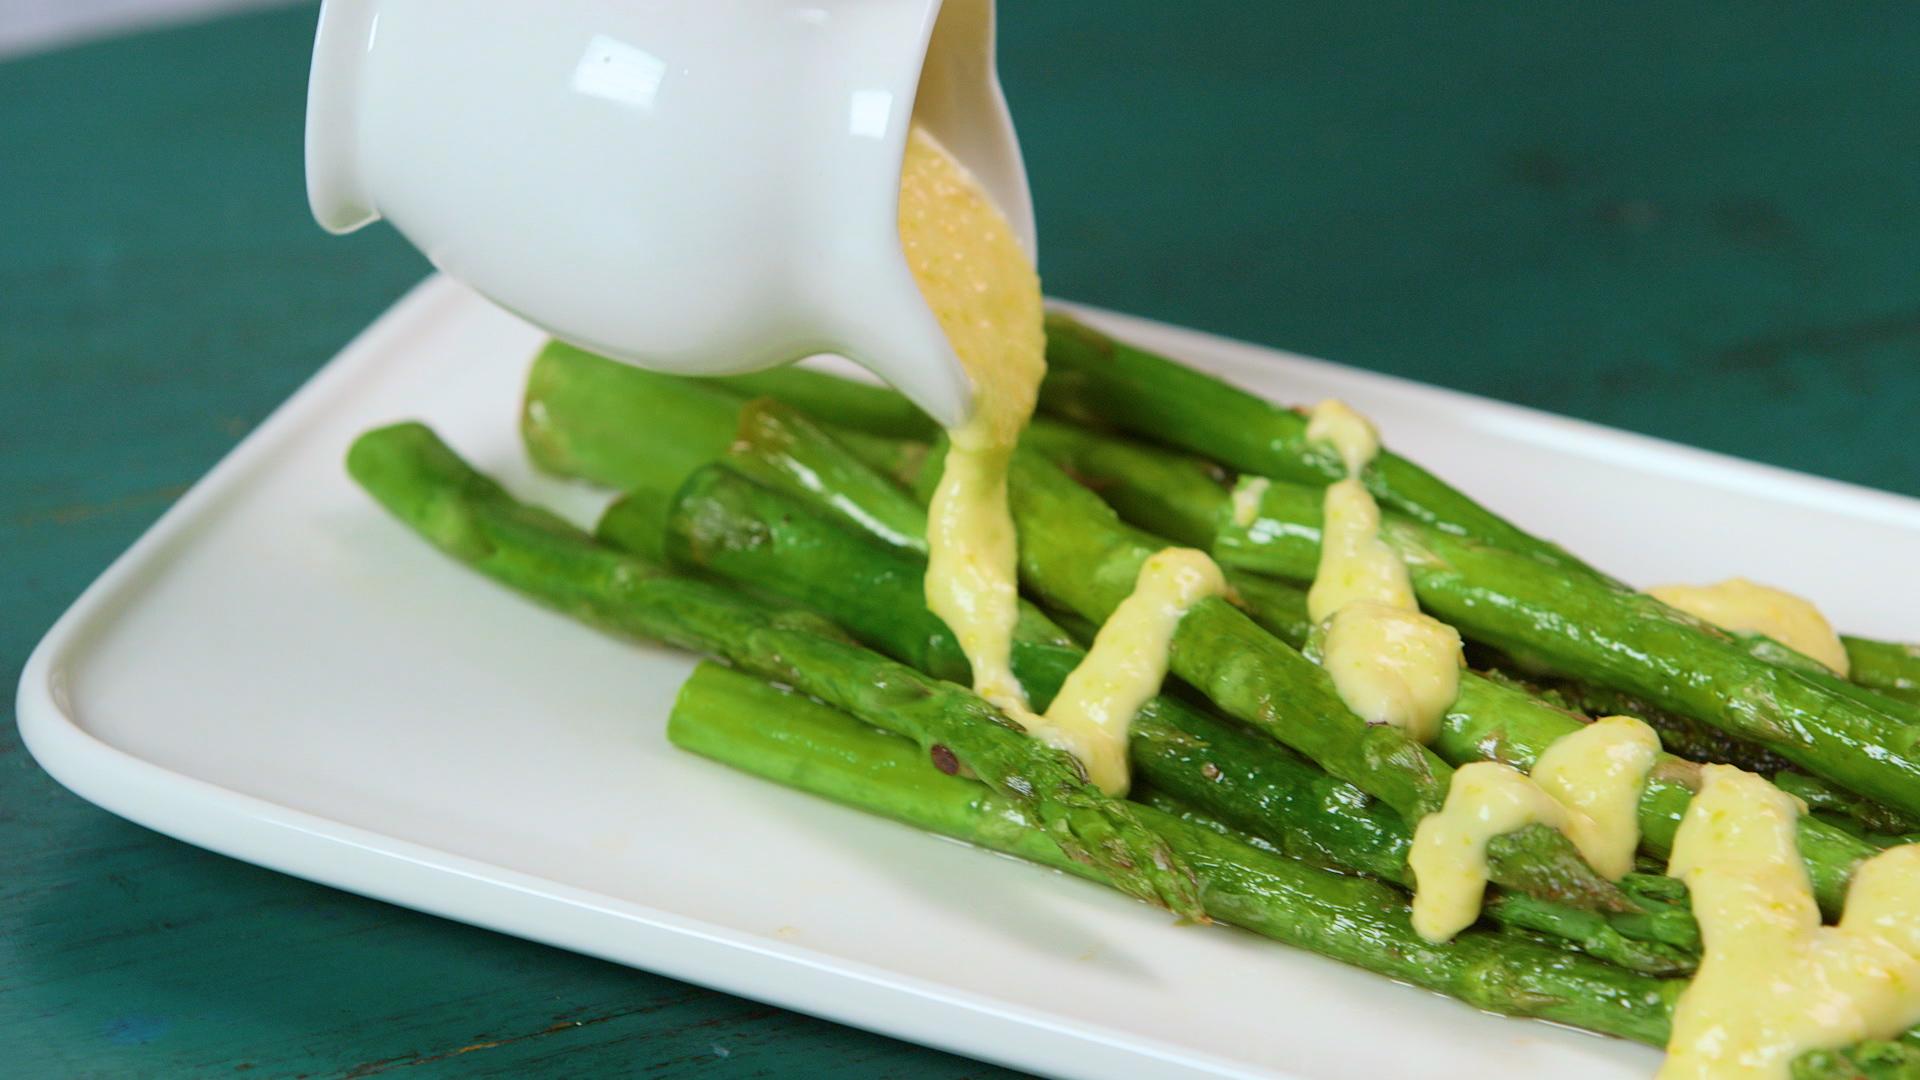 Vegan Mayo image